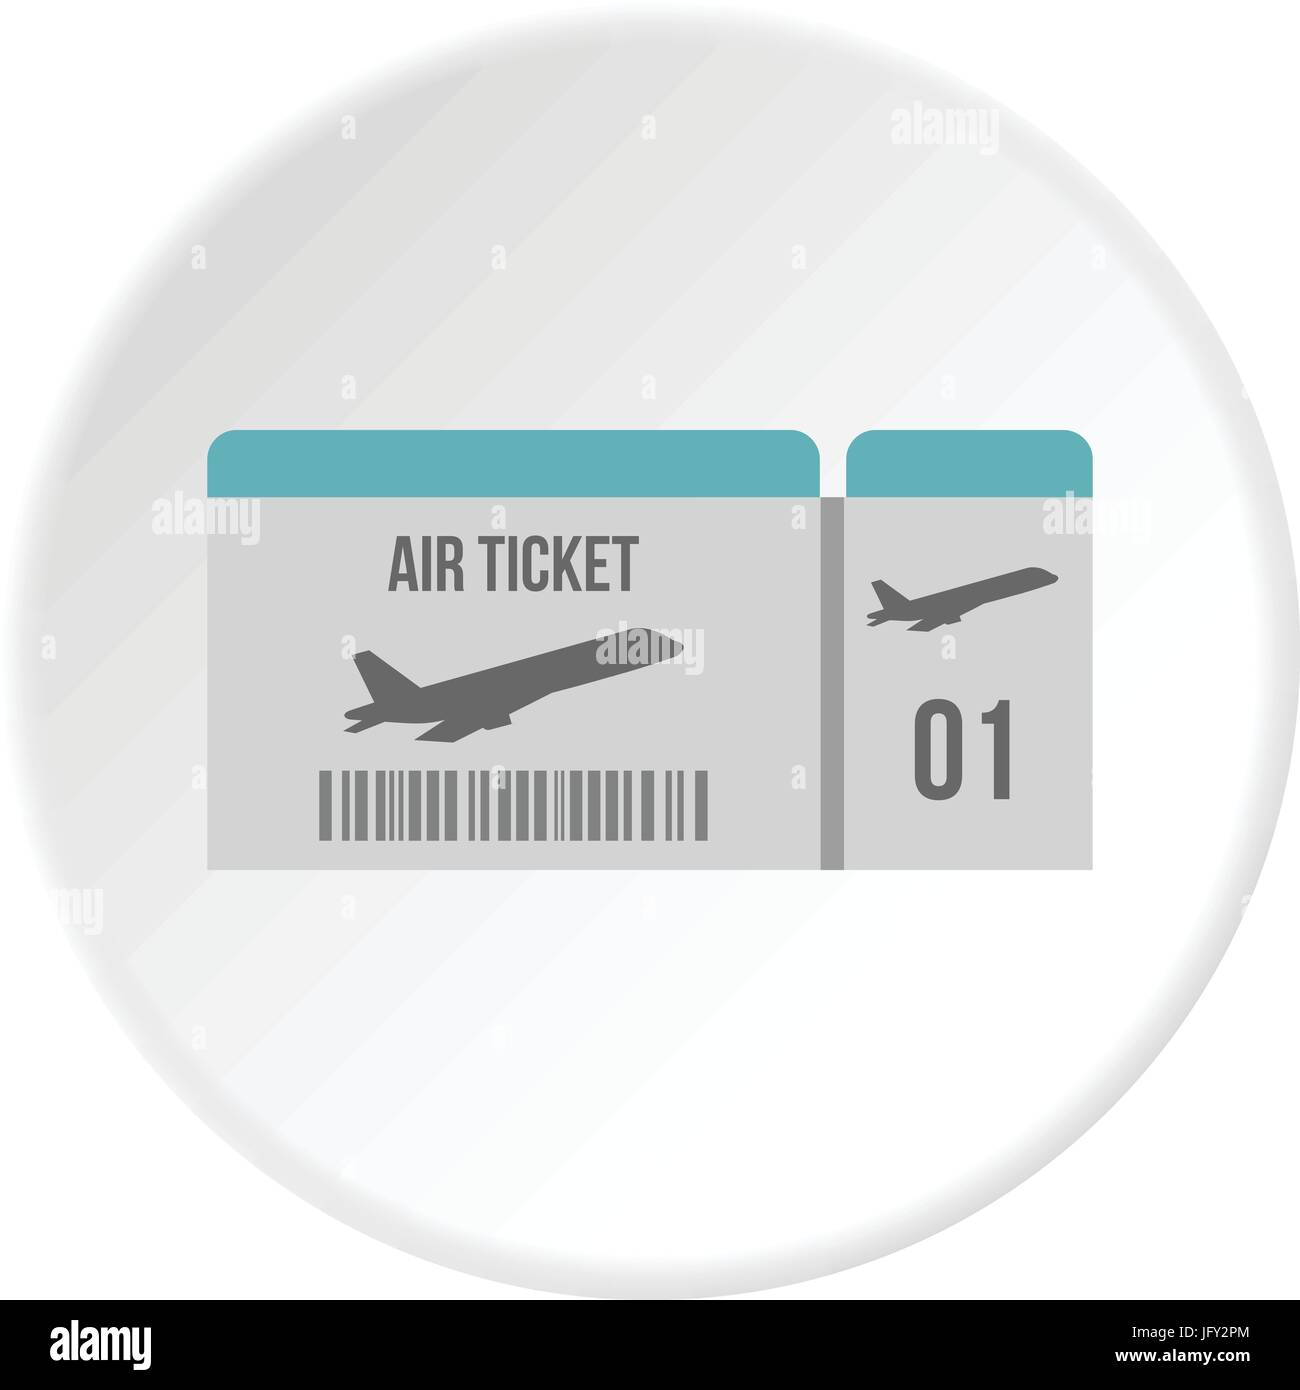 Air ticket icon circle - Stock Image